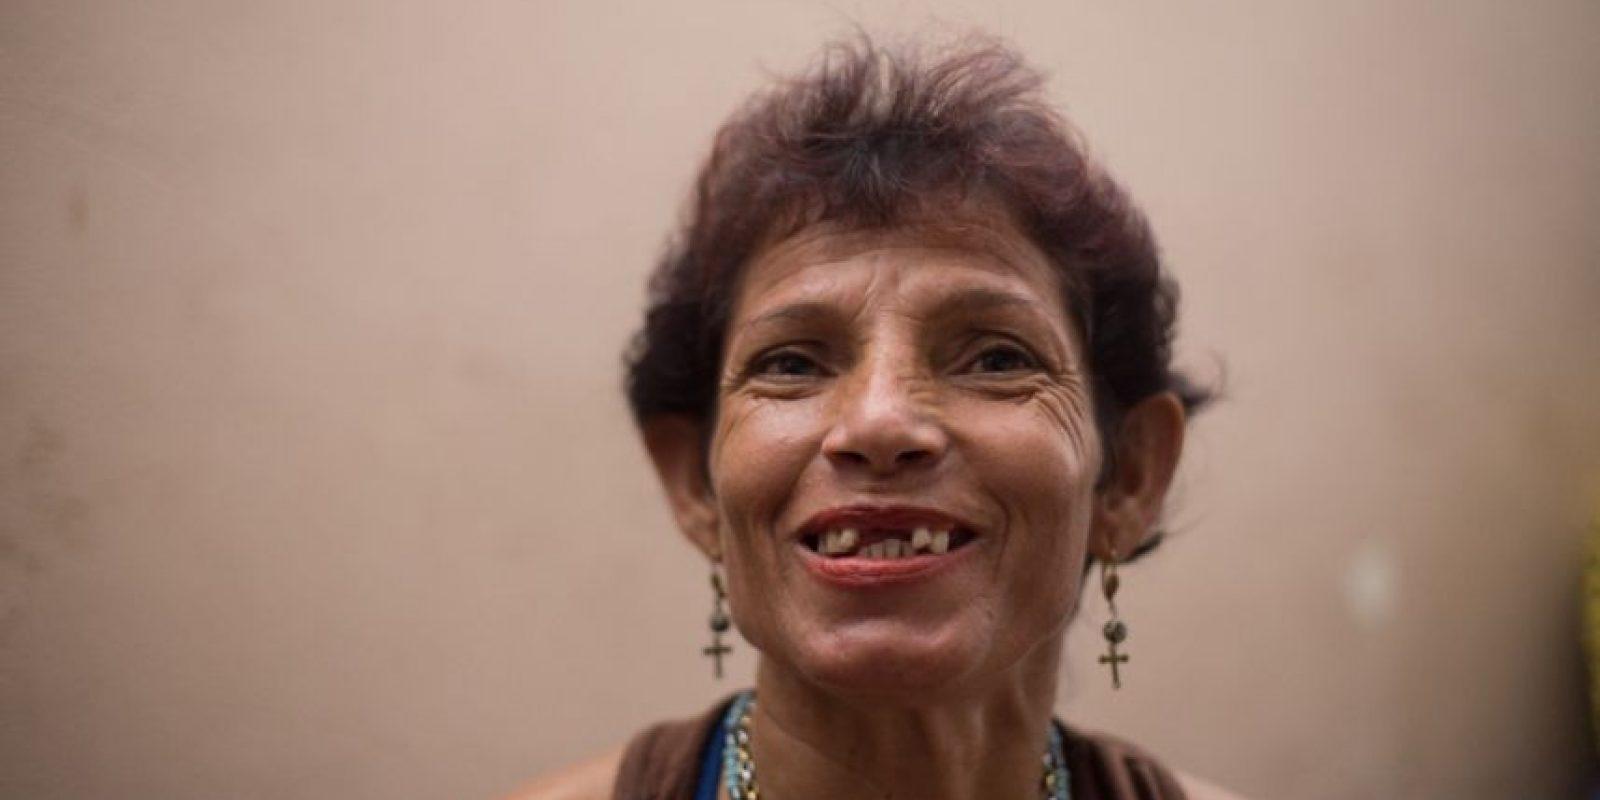 Maribel Gutiérrez Foto:César Nigrinis Name